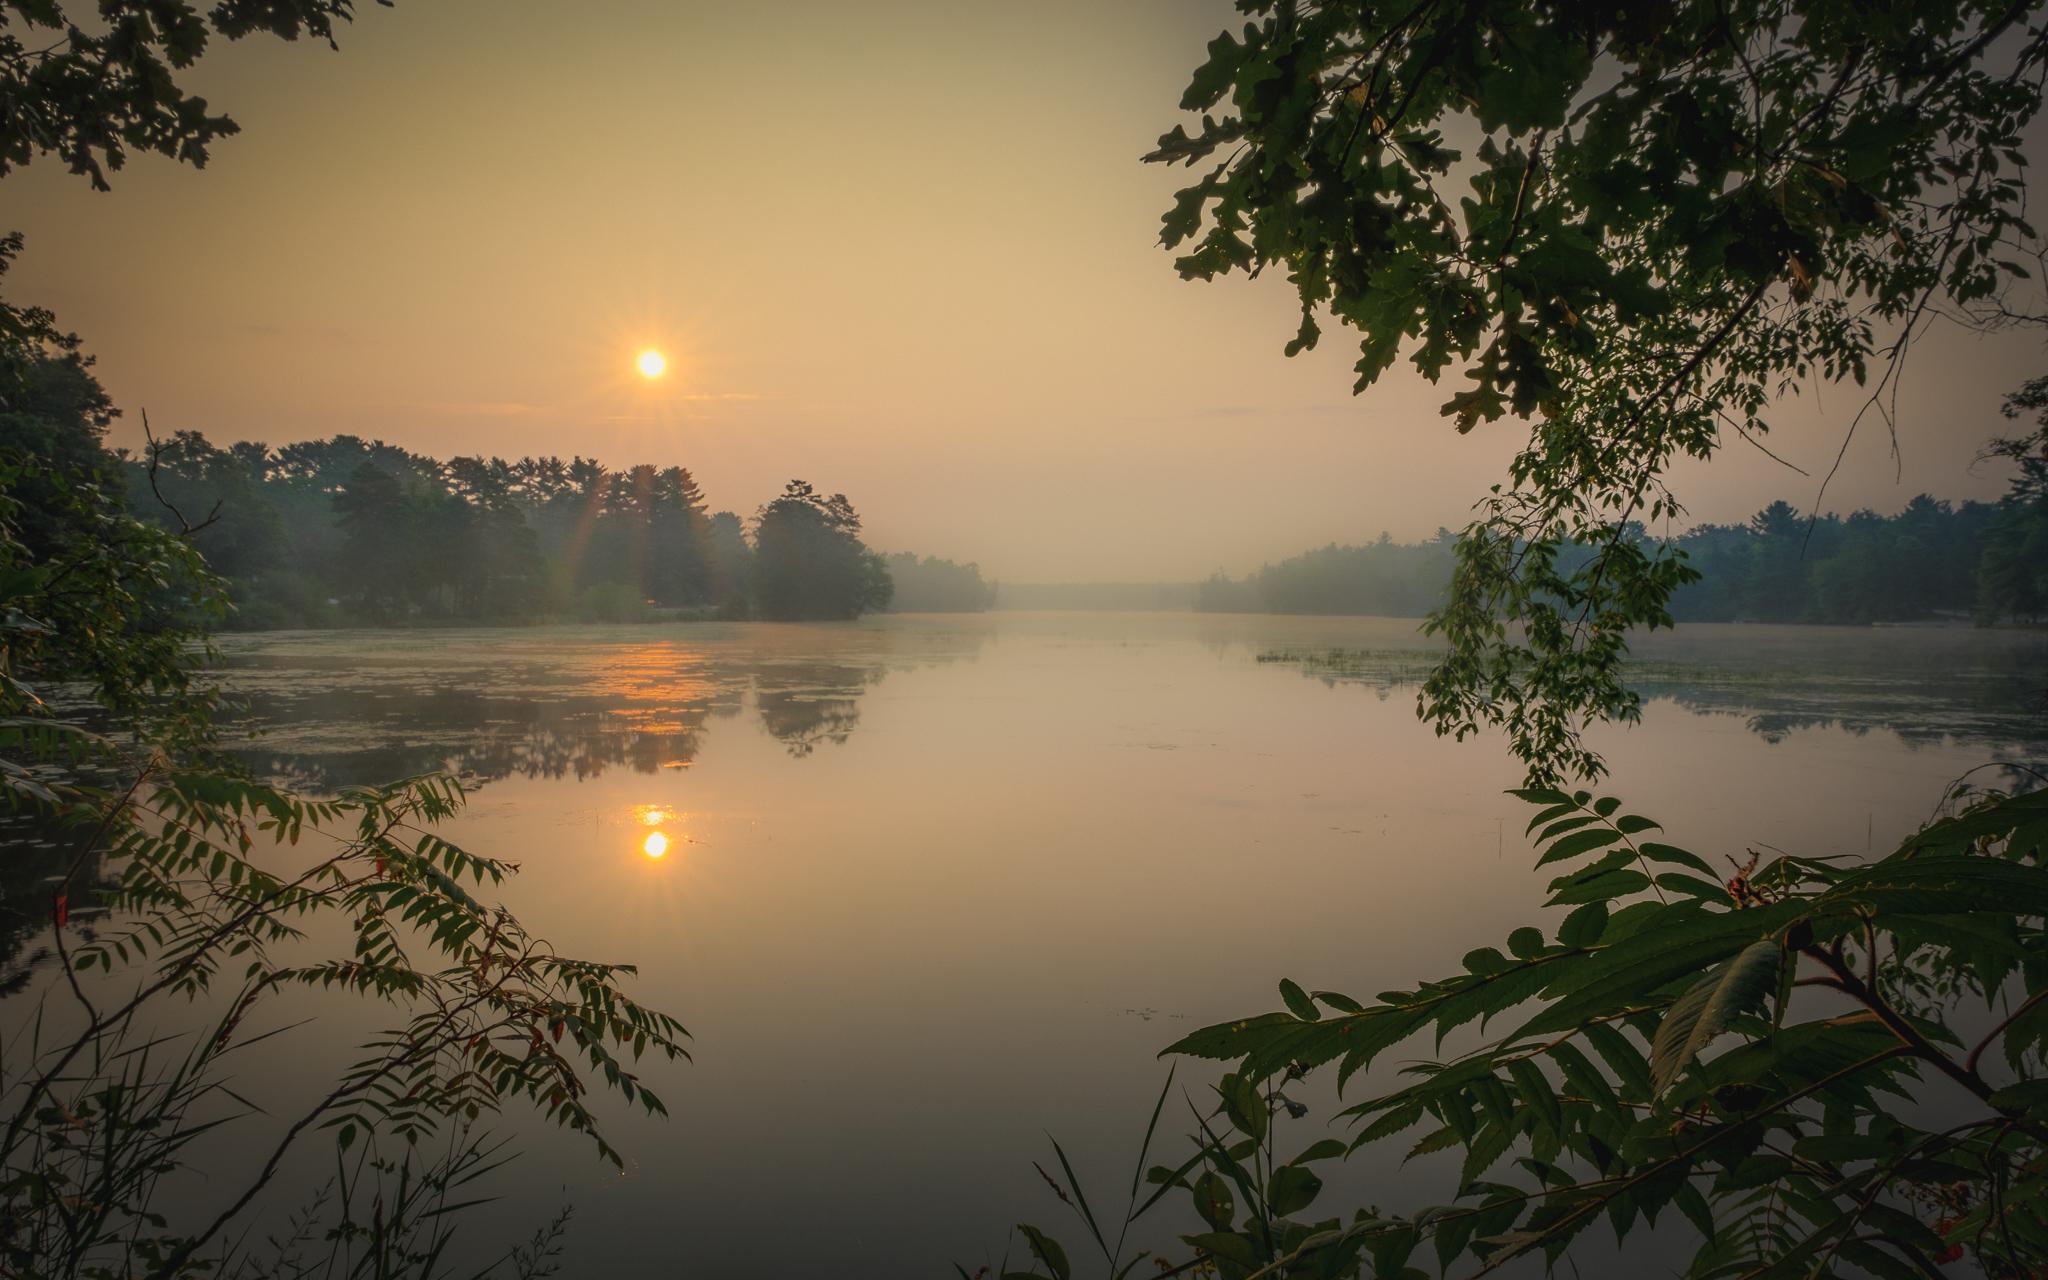 lake wazeecha, wisconsin, wildfire smoke, haze, sunrise, reflection, sunrise